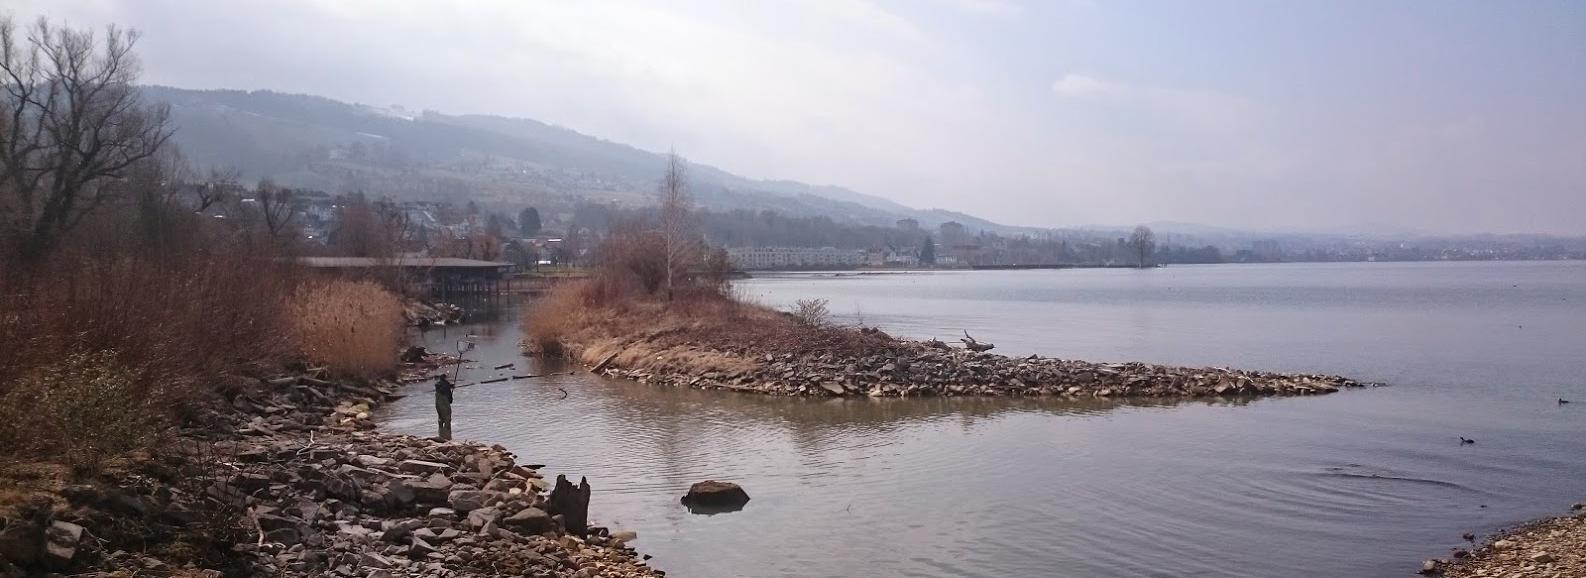 Lake Constance shoreline